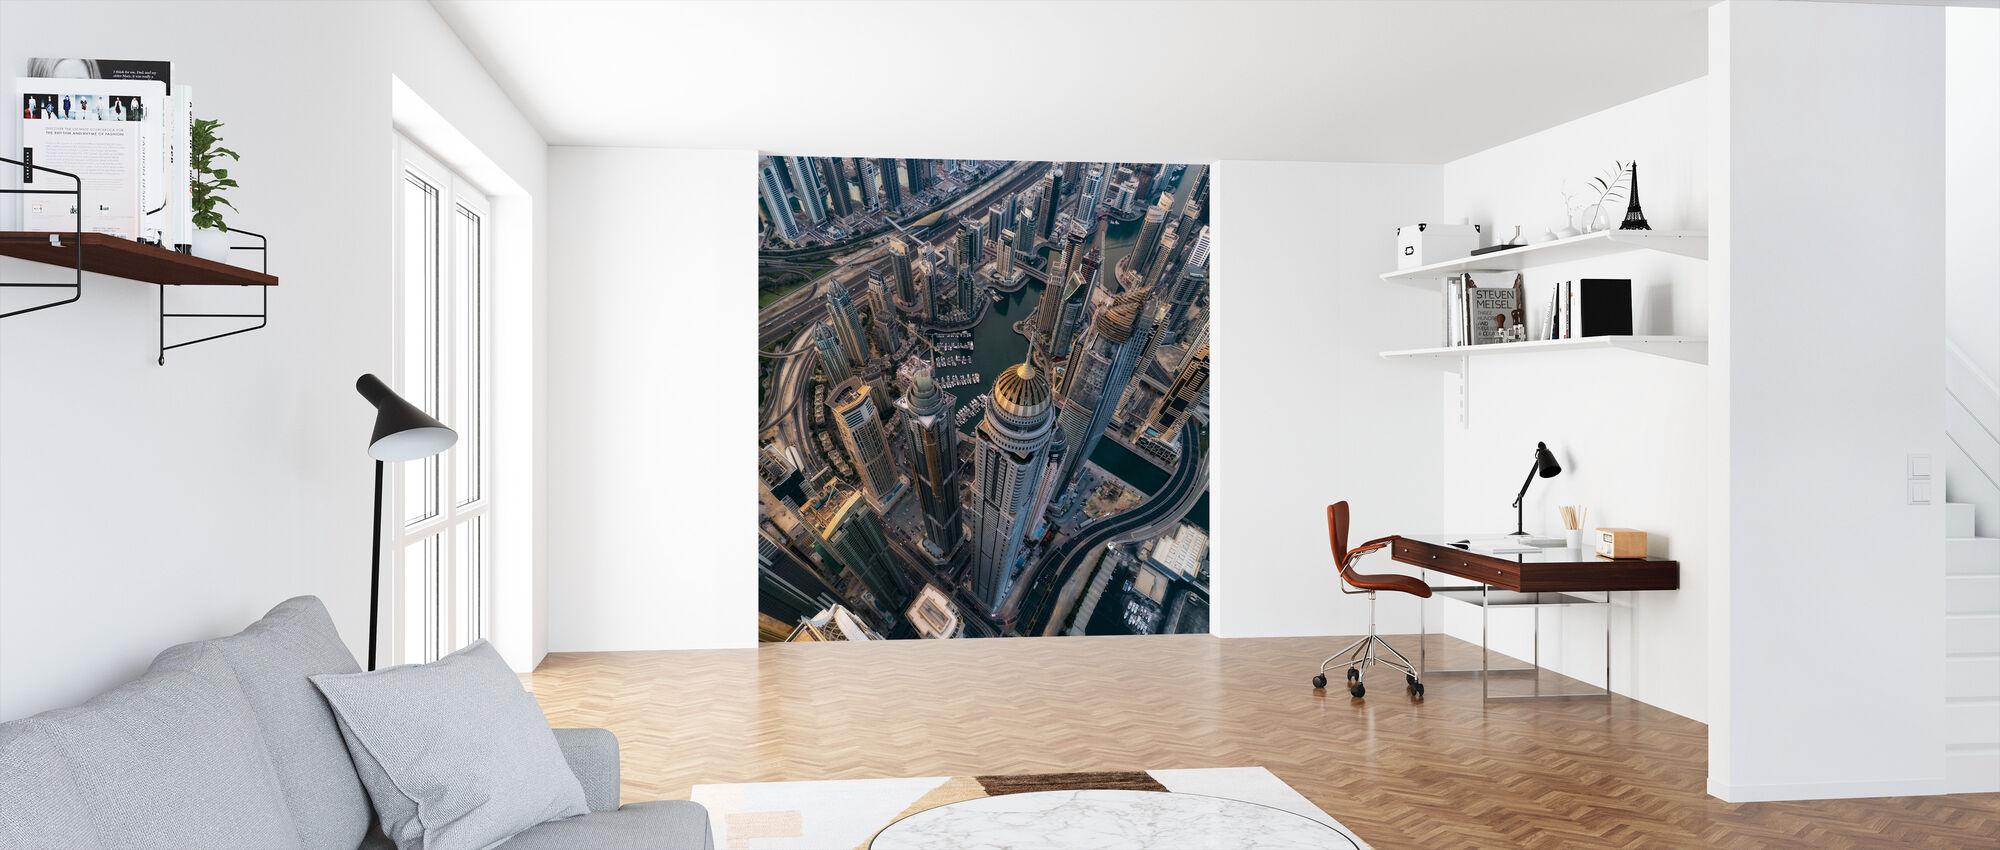 Princess Marina - Wallpaper - Office